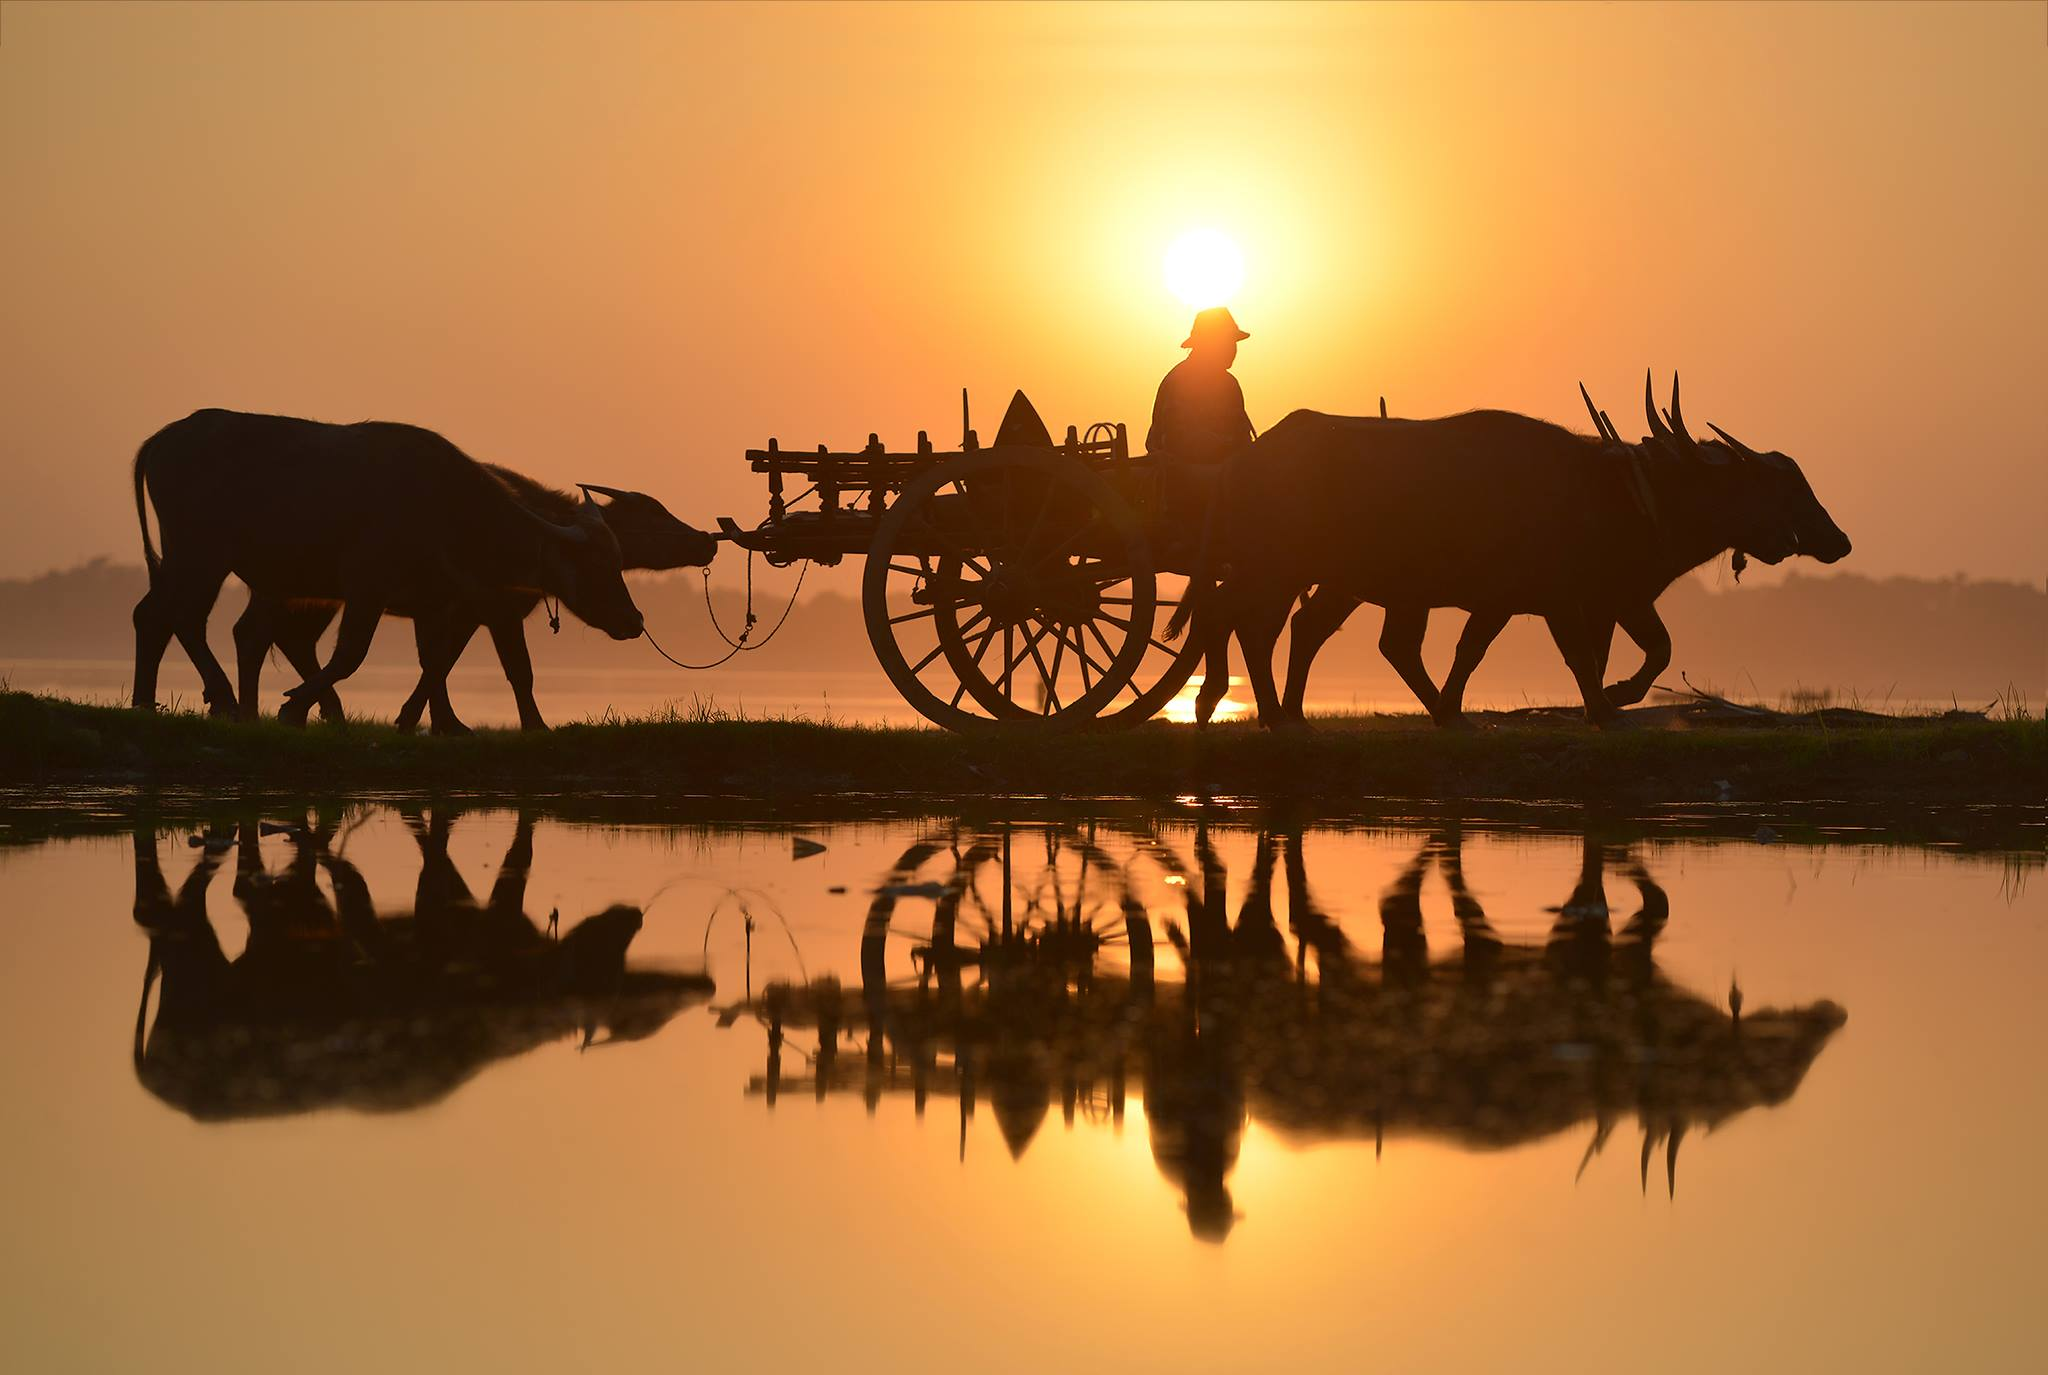 Myanmar ,Southeast,Animal, sarawut intarob